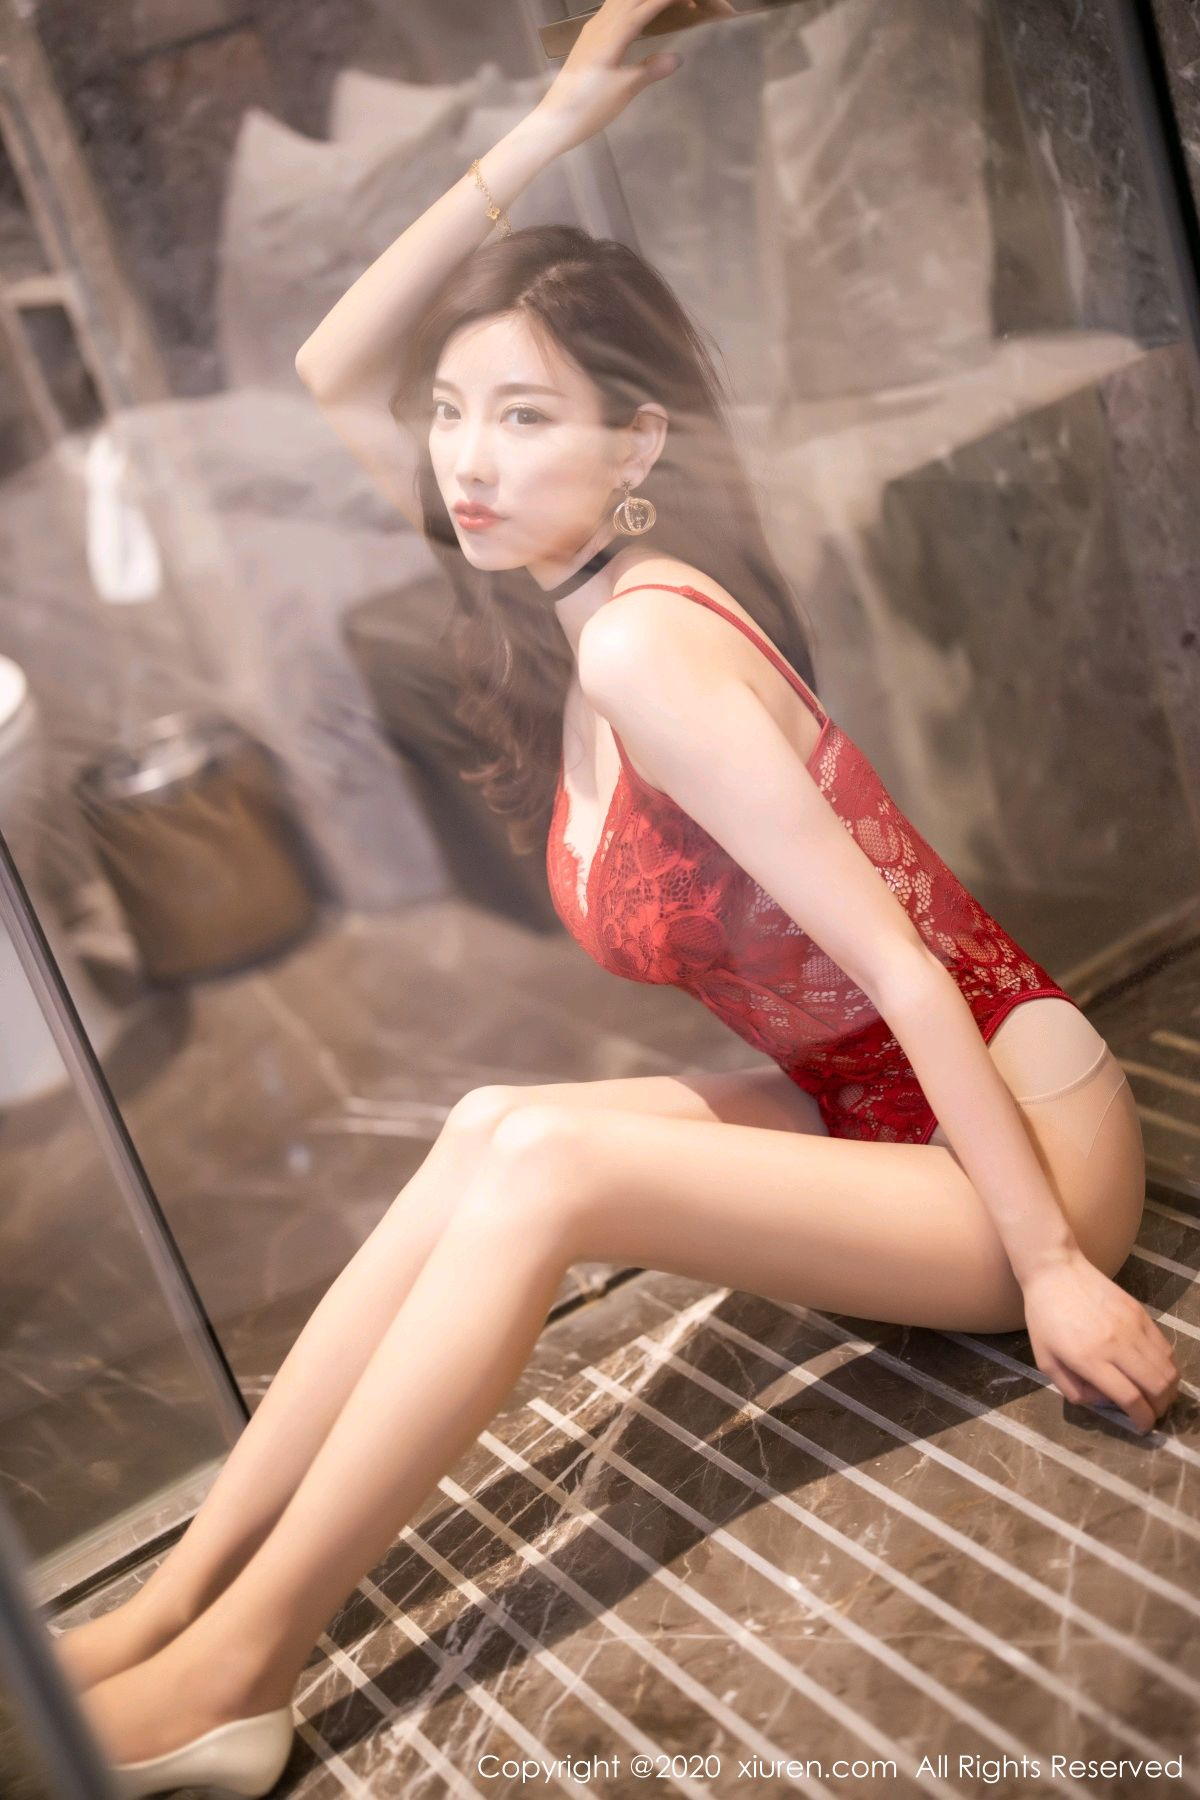 [XiuRen] Vol.2671 Yang Chen Chen 45P, Underwear, Xiuren, Yang Chen Chen